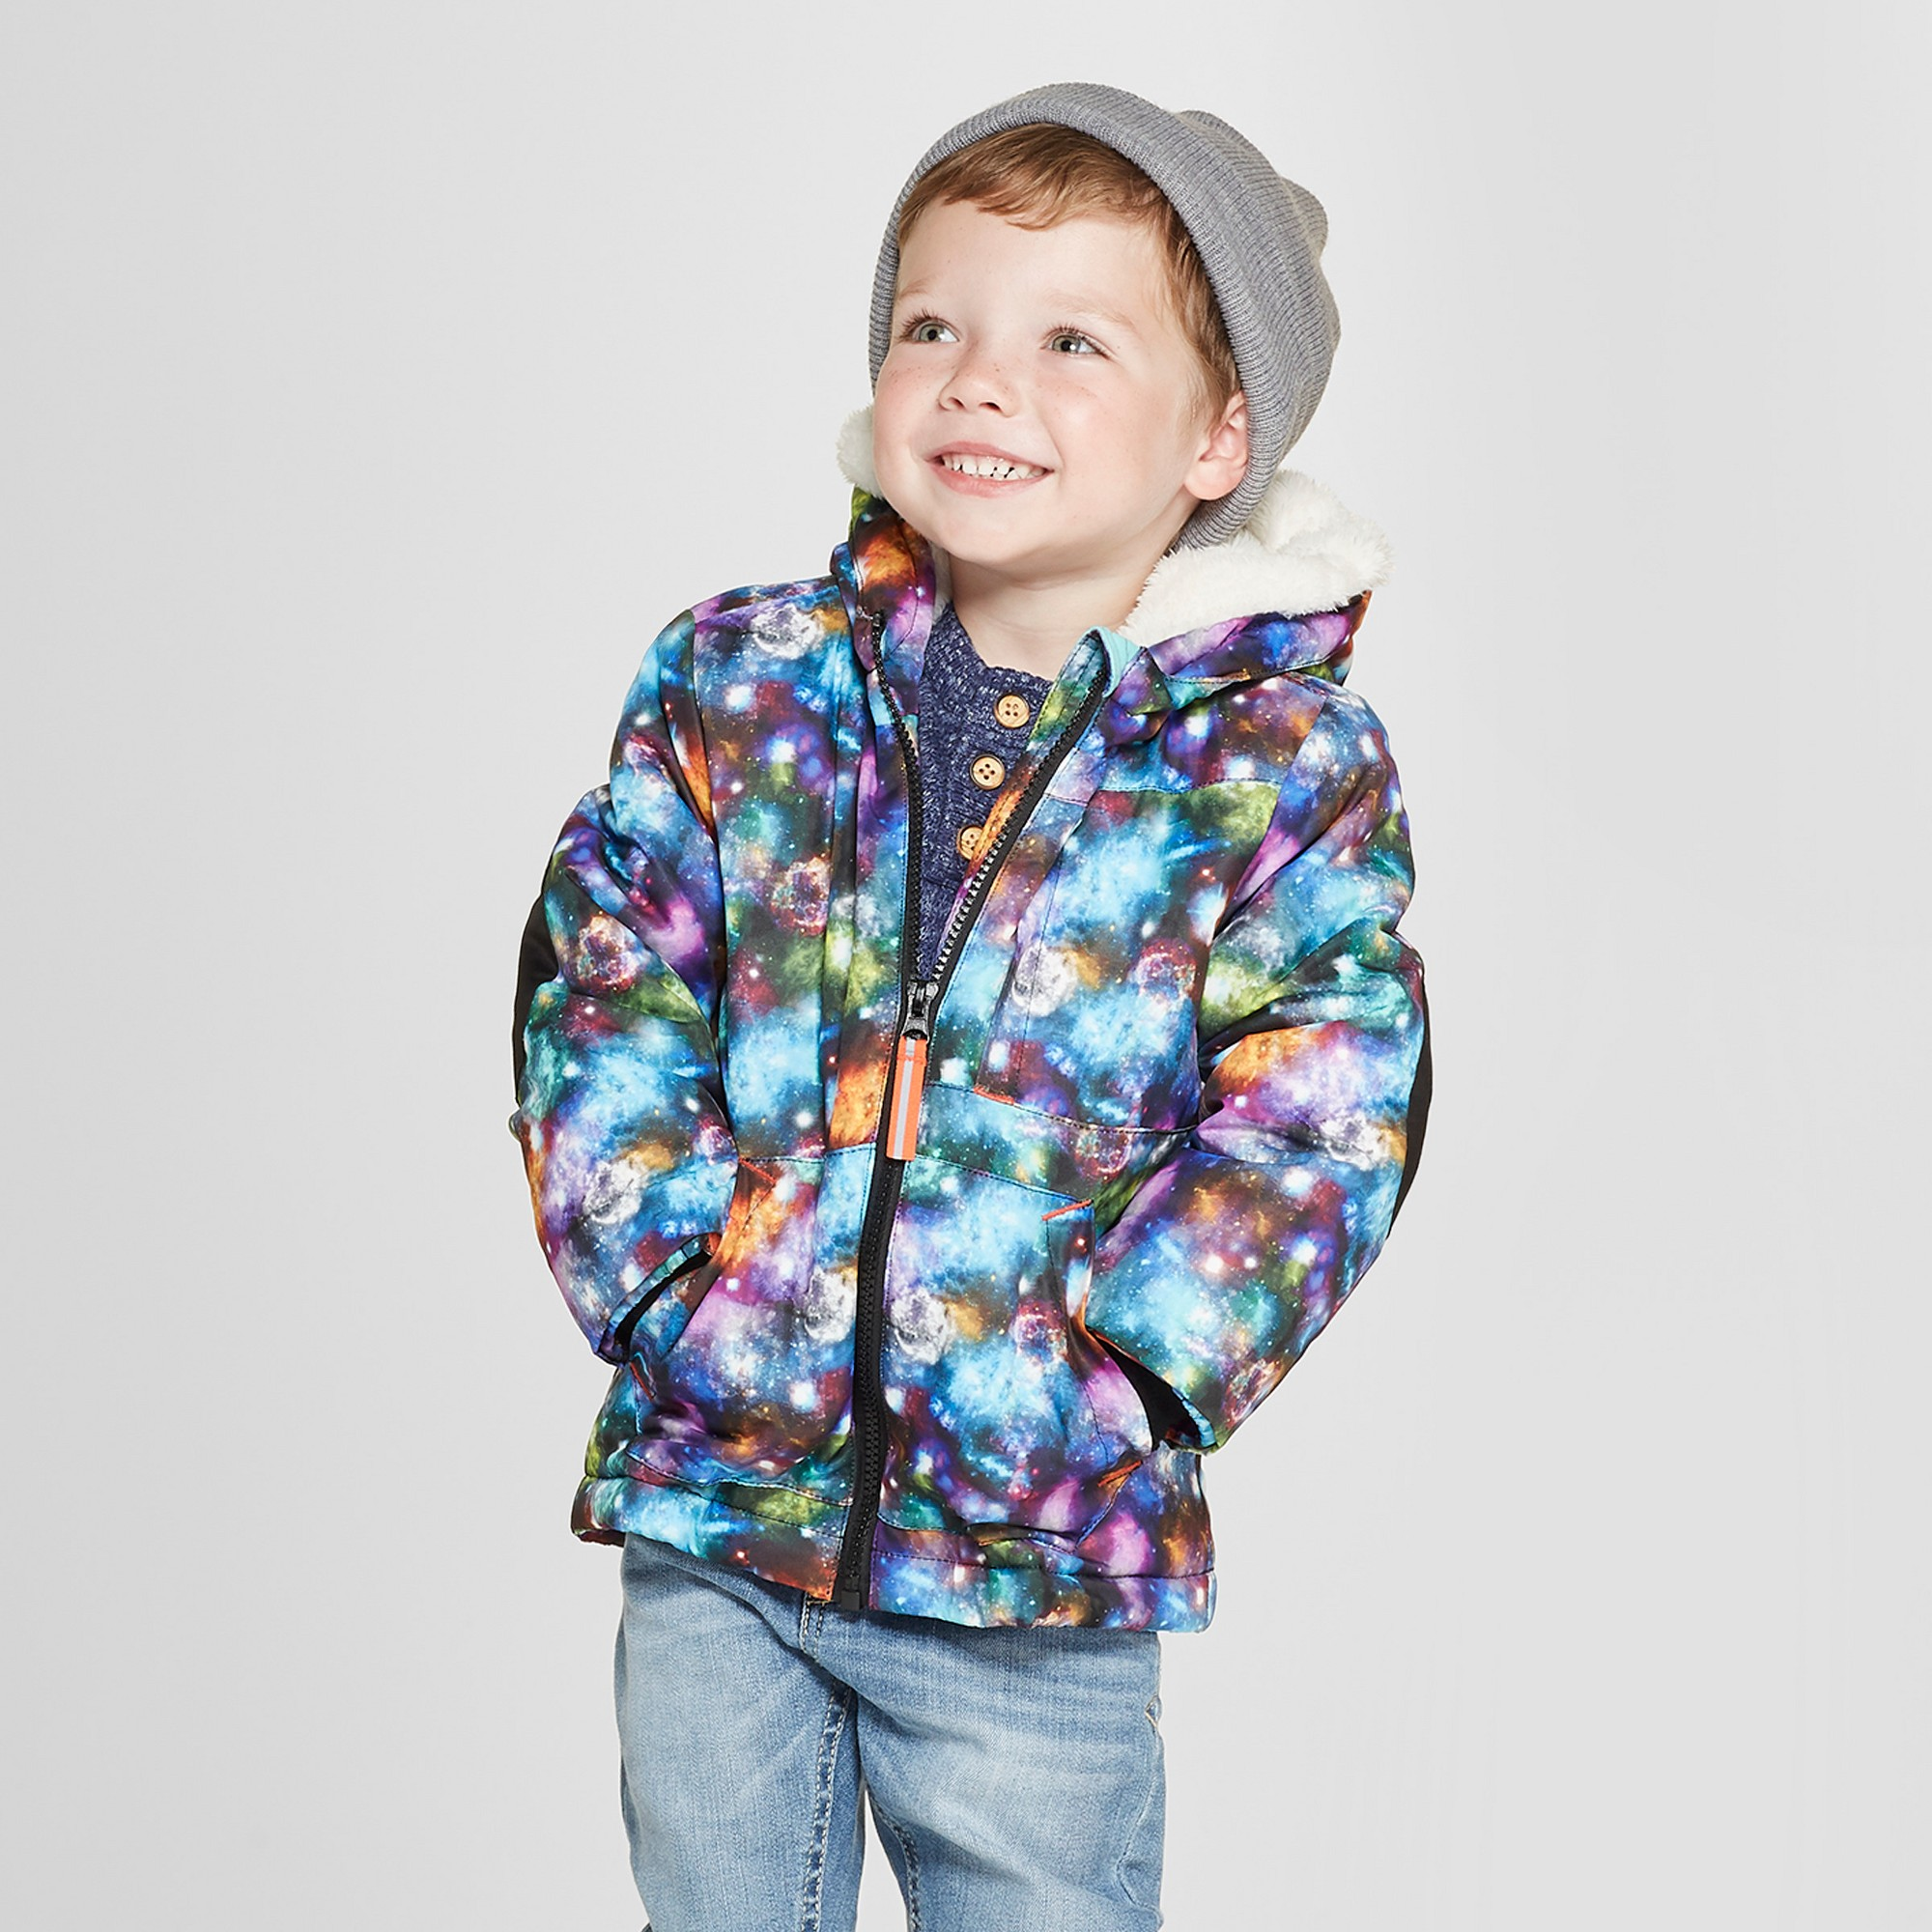 7a8a3a720 Toddler Boys  Galaxy Softshell Jacket - Cat   Jack Black 18M in 2018 ...